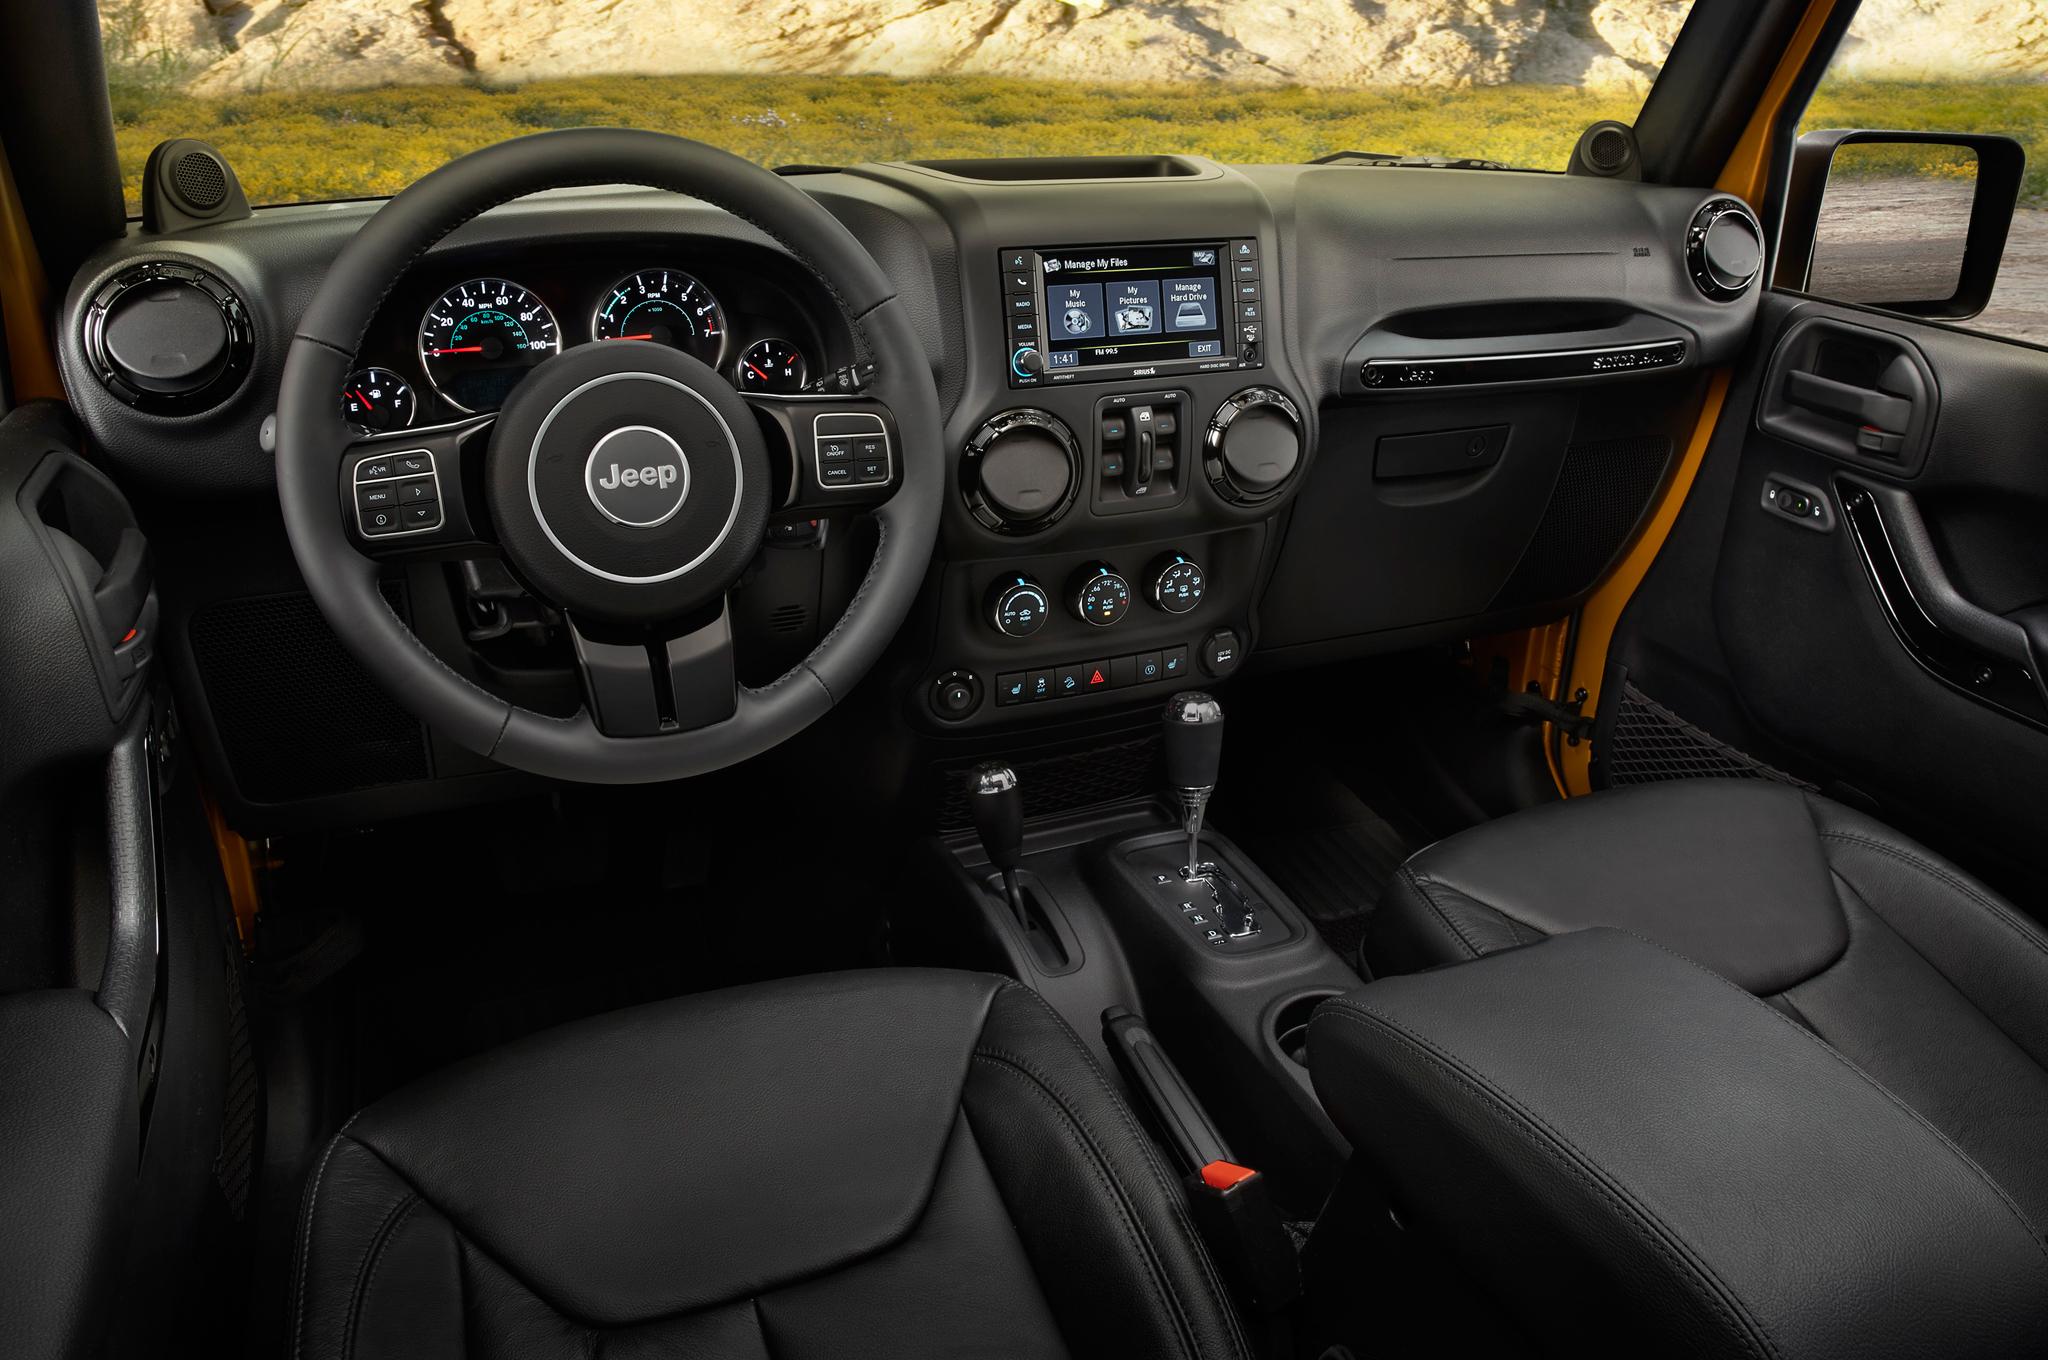 jeep-wrangler-2014-interior-wallpaper-7